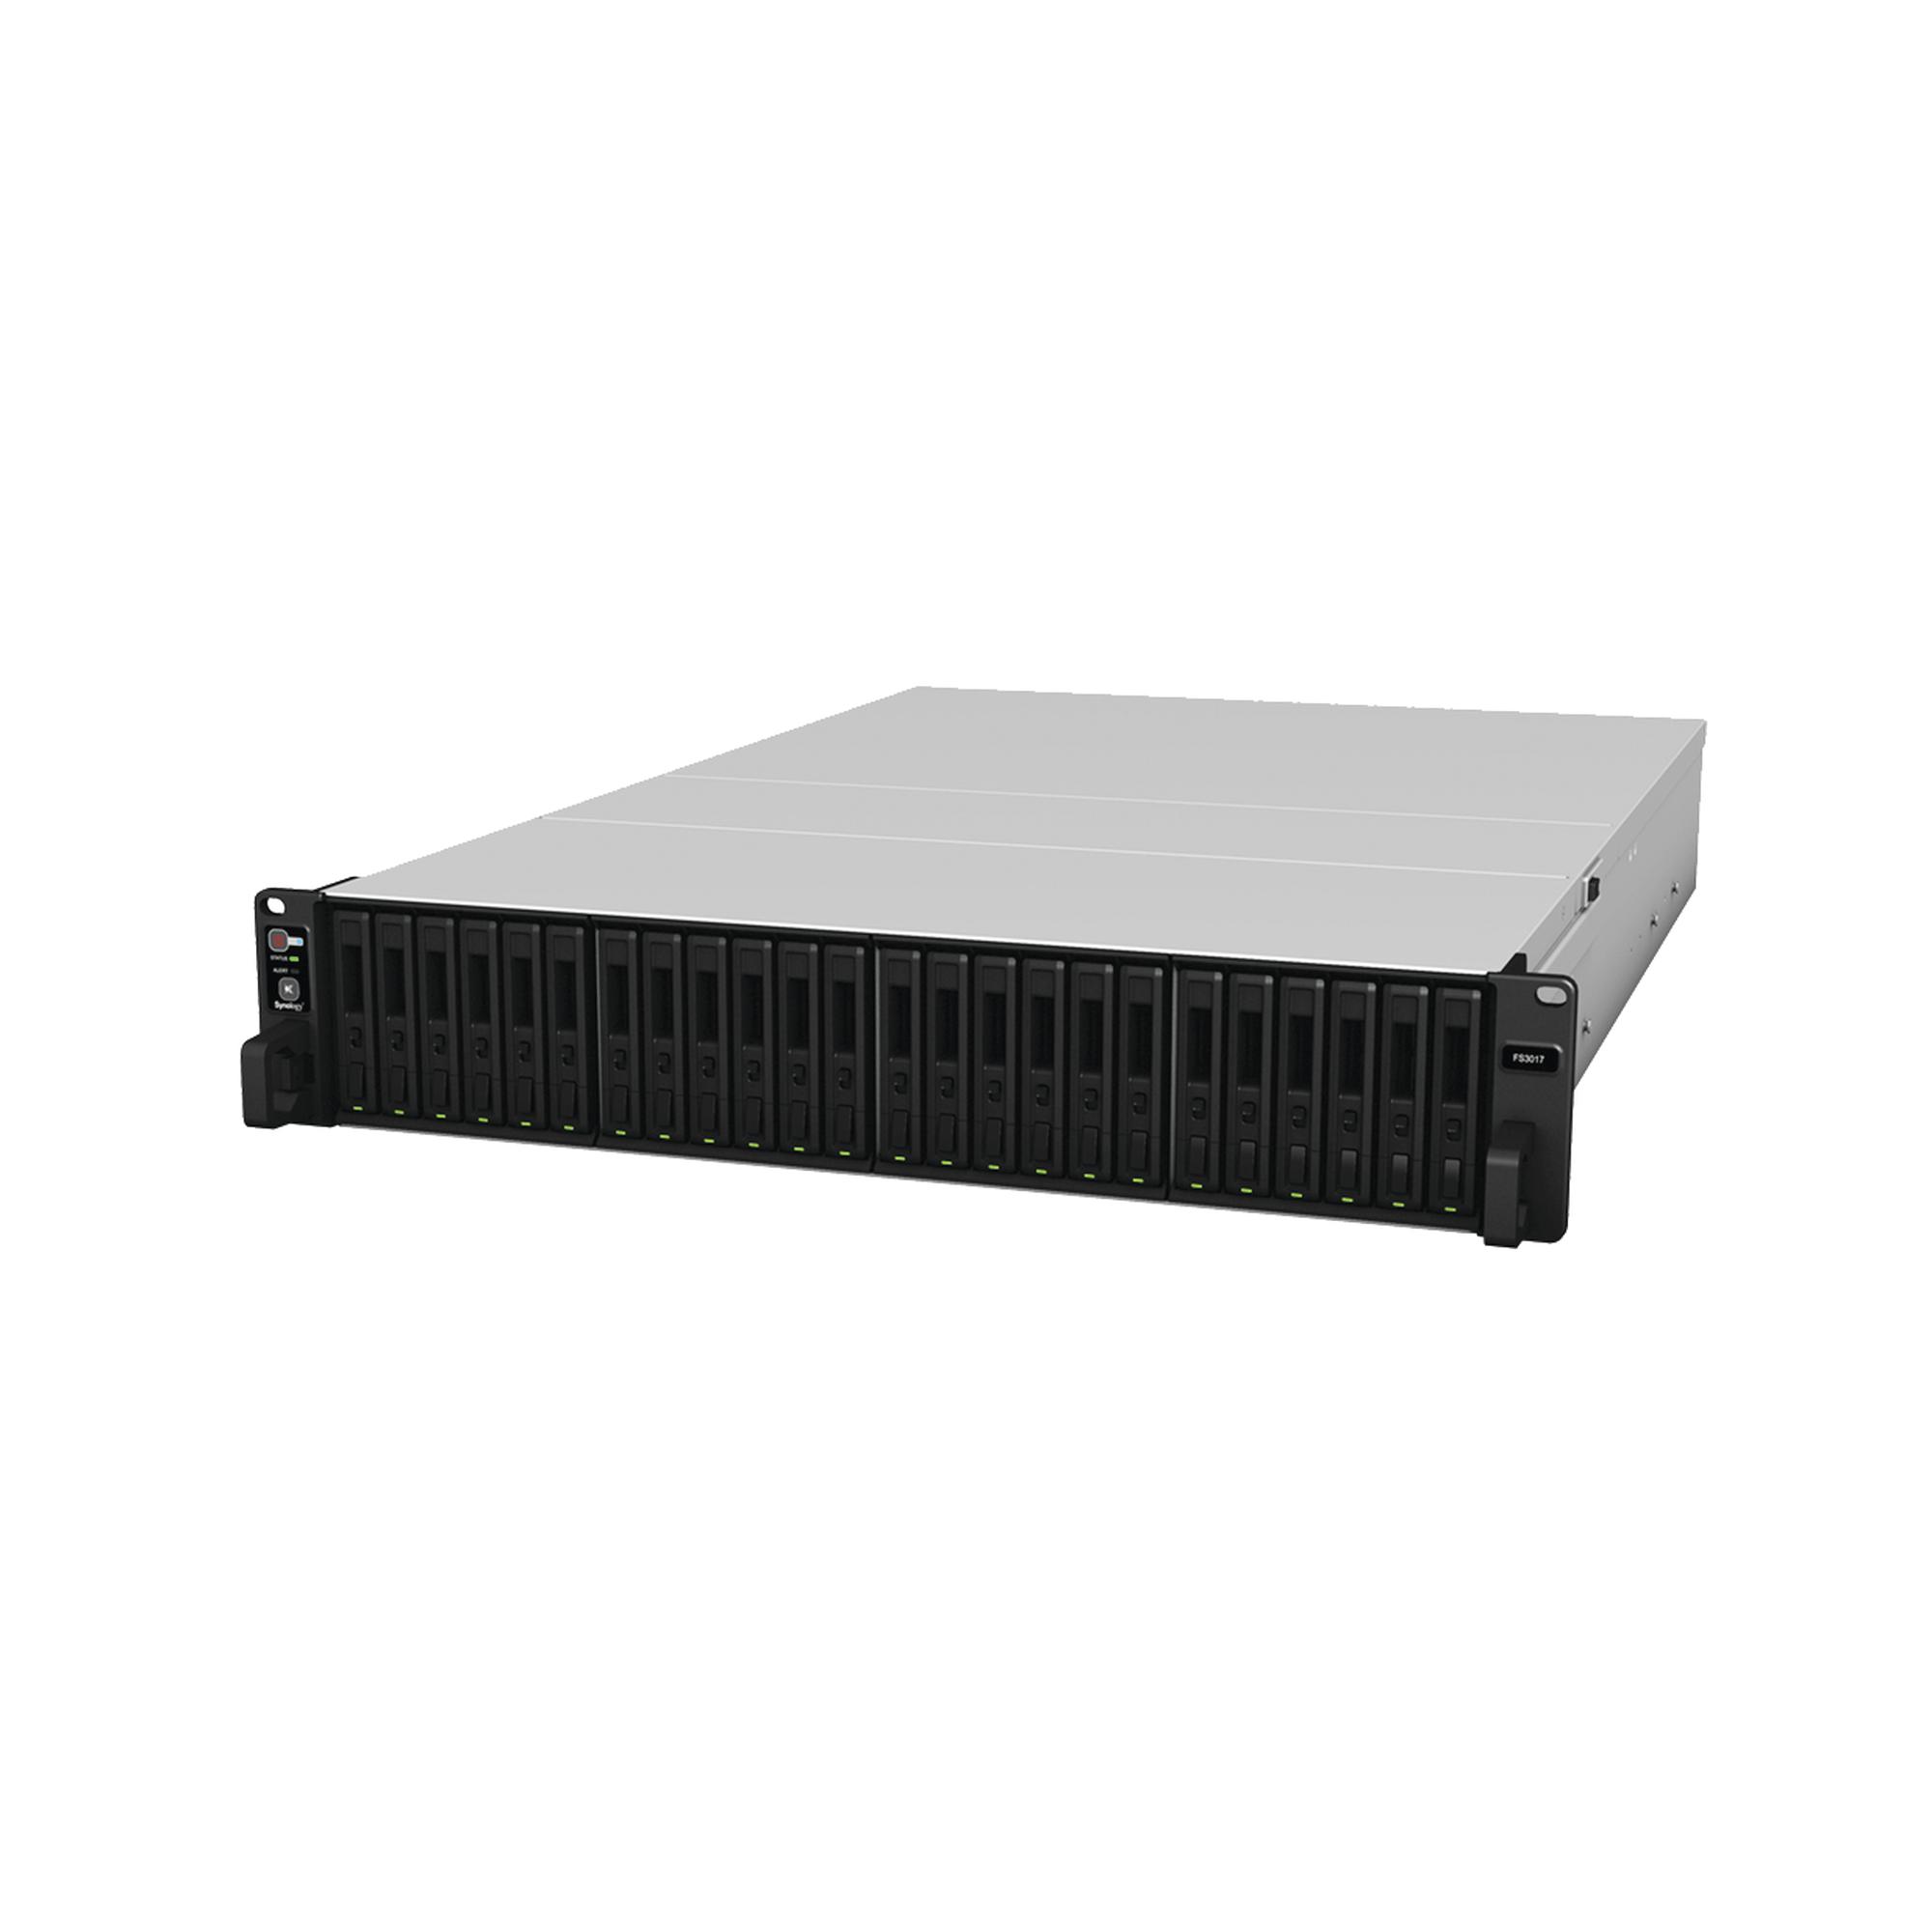 Servidor FlashStation de 24 bahías / Expandible a 72 bahías / Hasta 288 TB